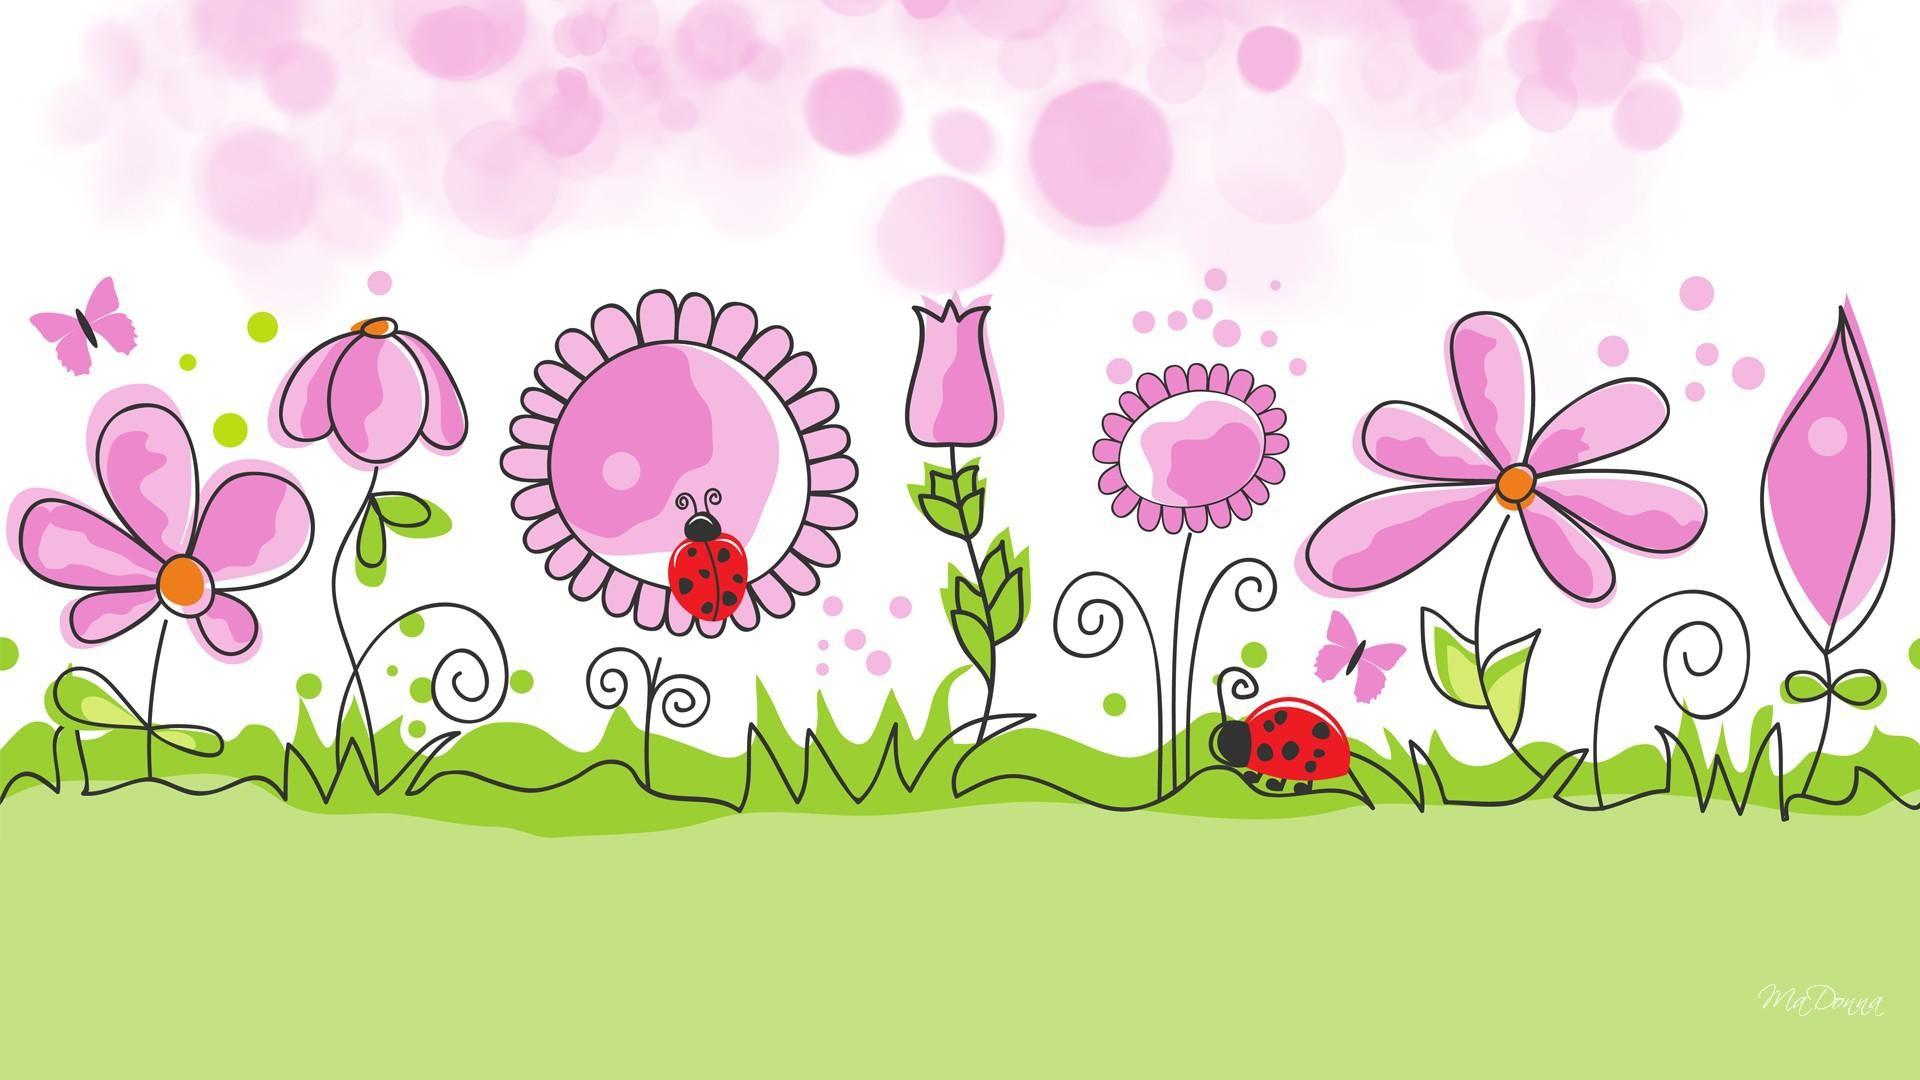 HD Flower Garden Spring Vector Free Desktop Background Wallpaper .